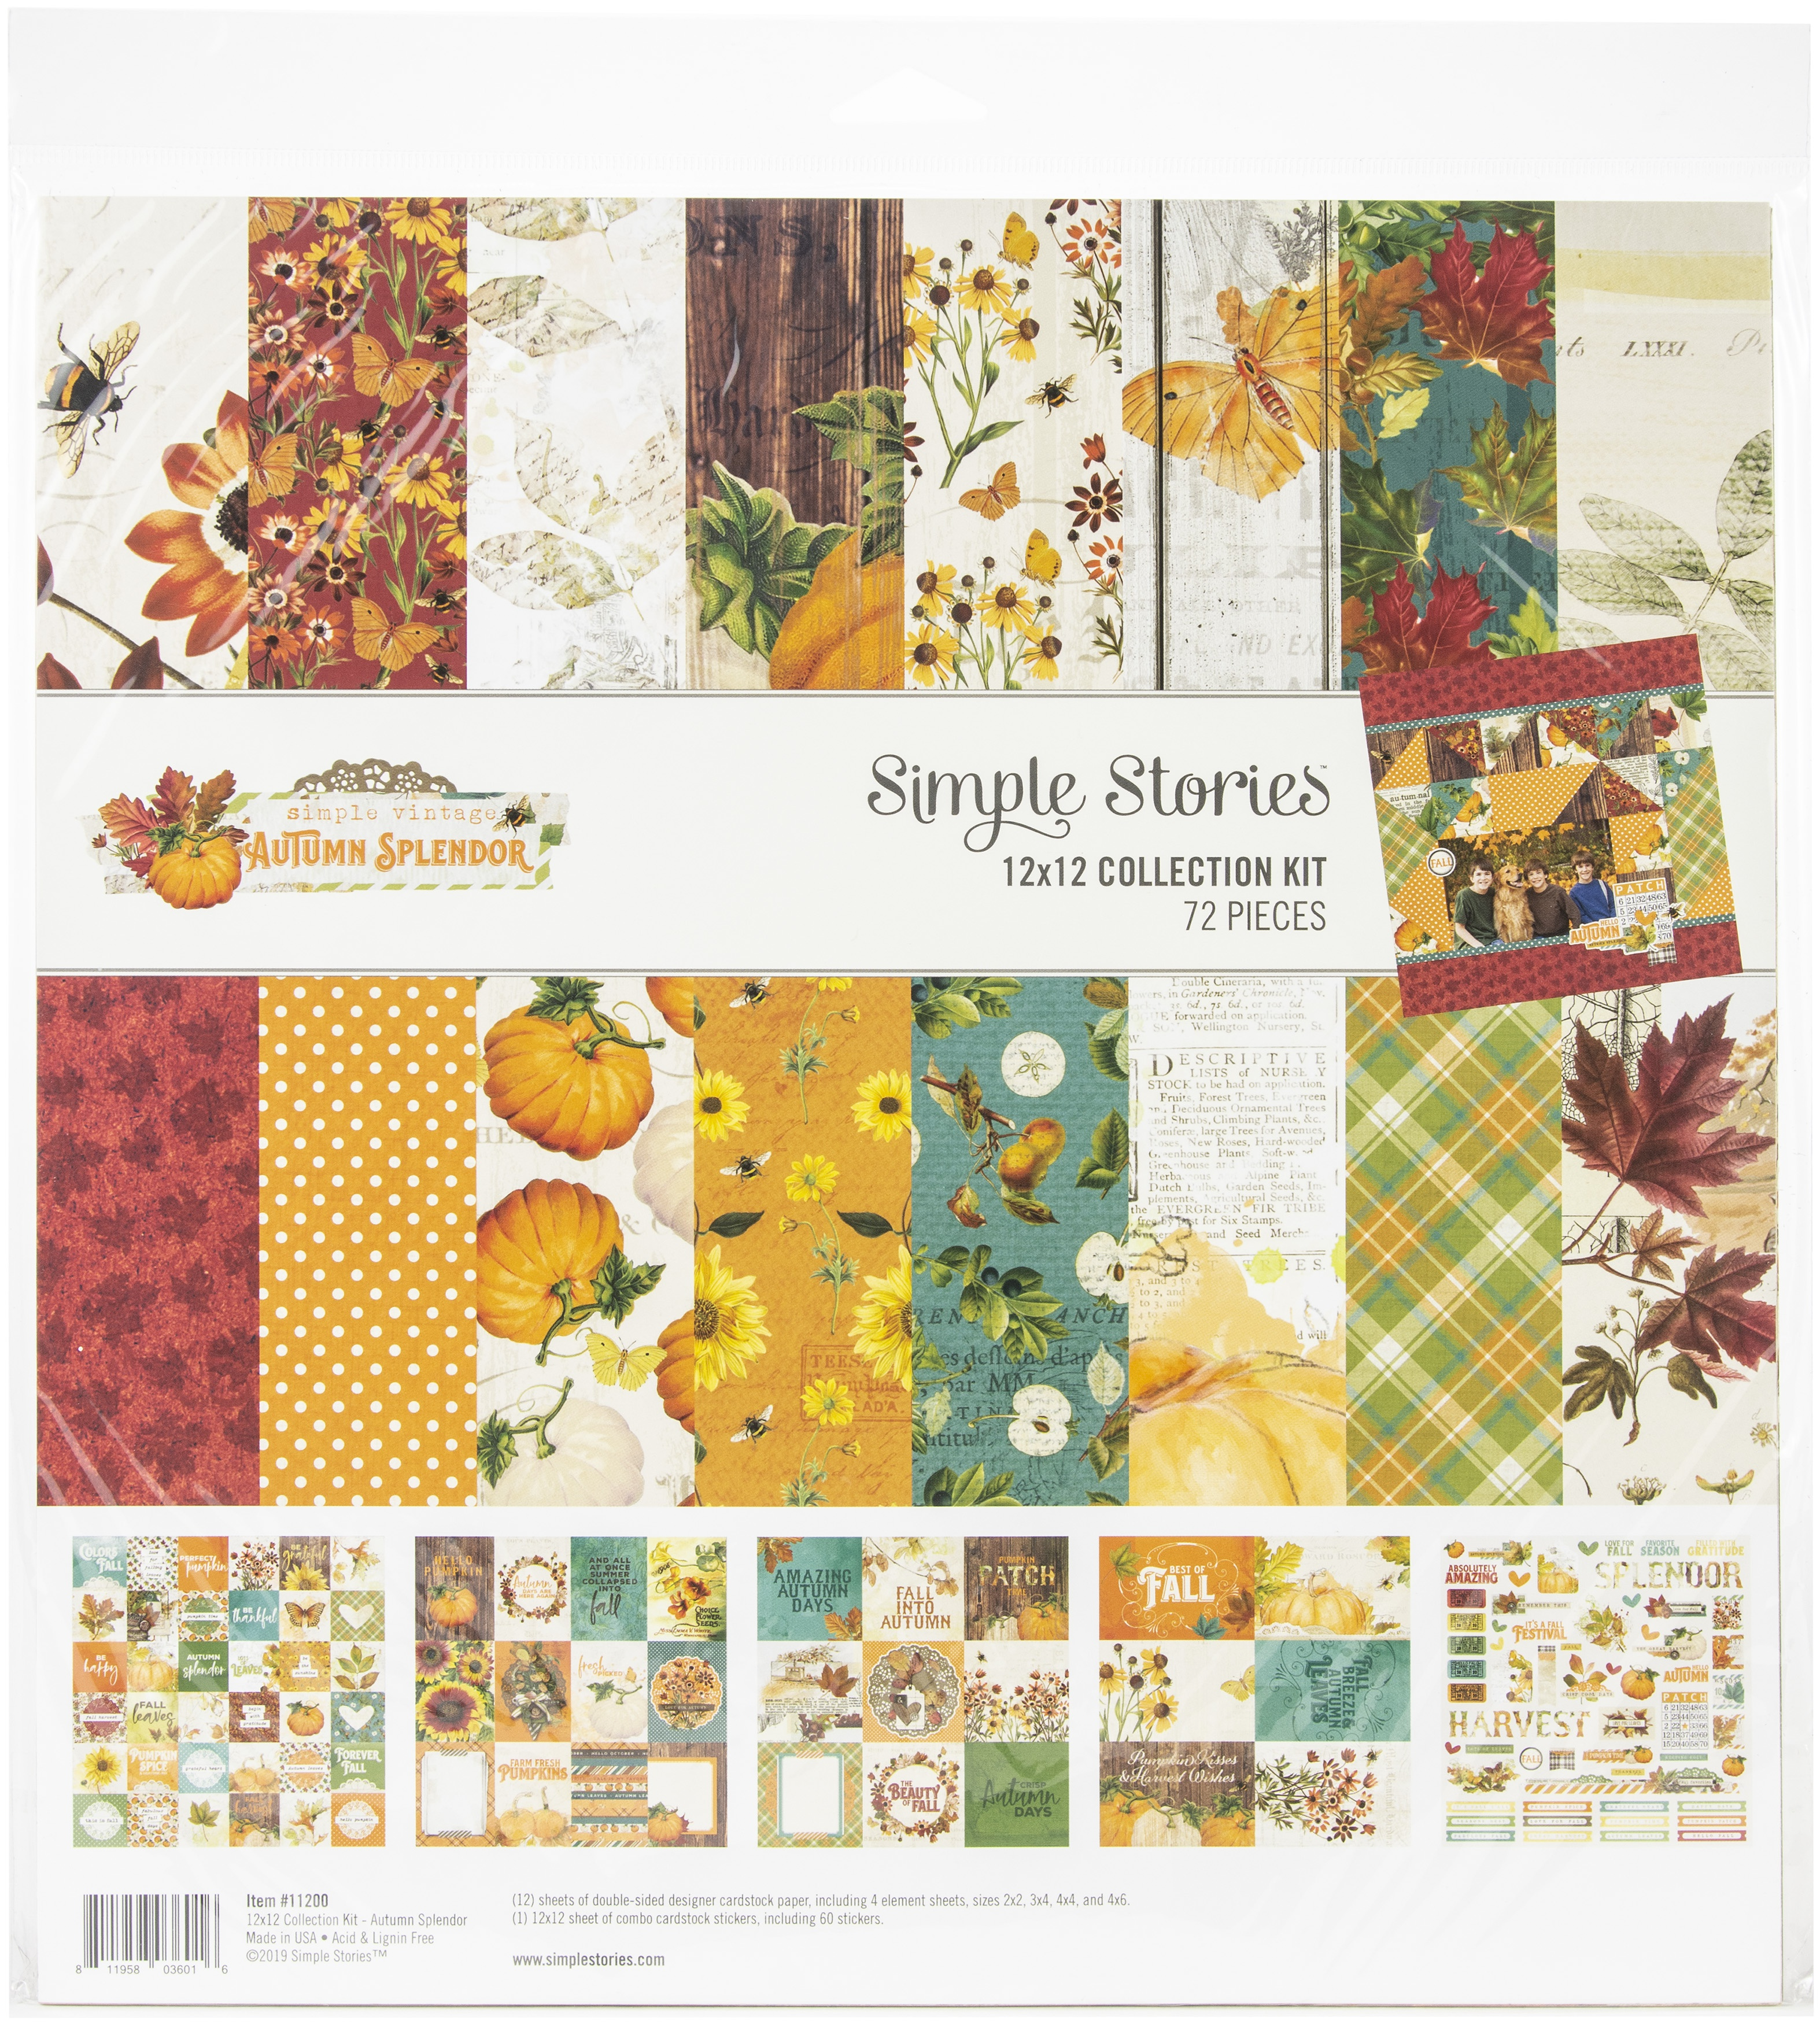 Simple Stories Autumn Splendor - 12x12 Collection Kit